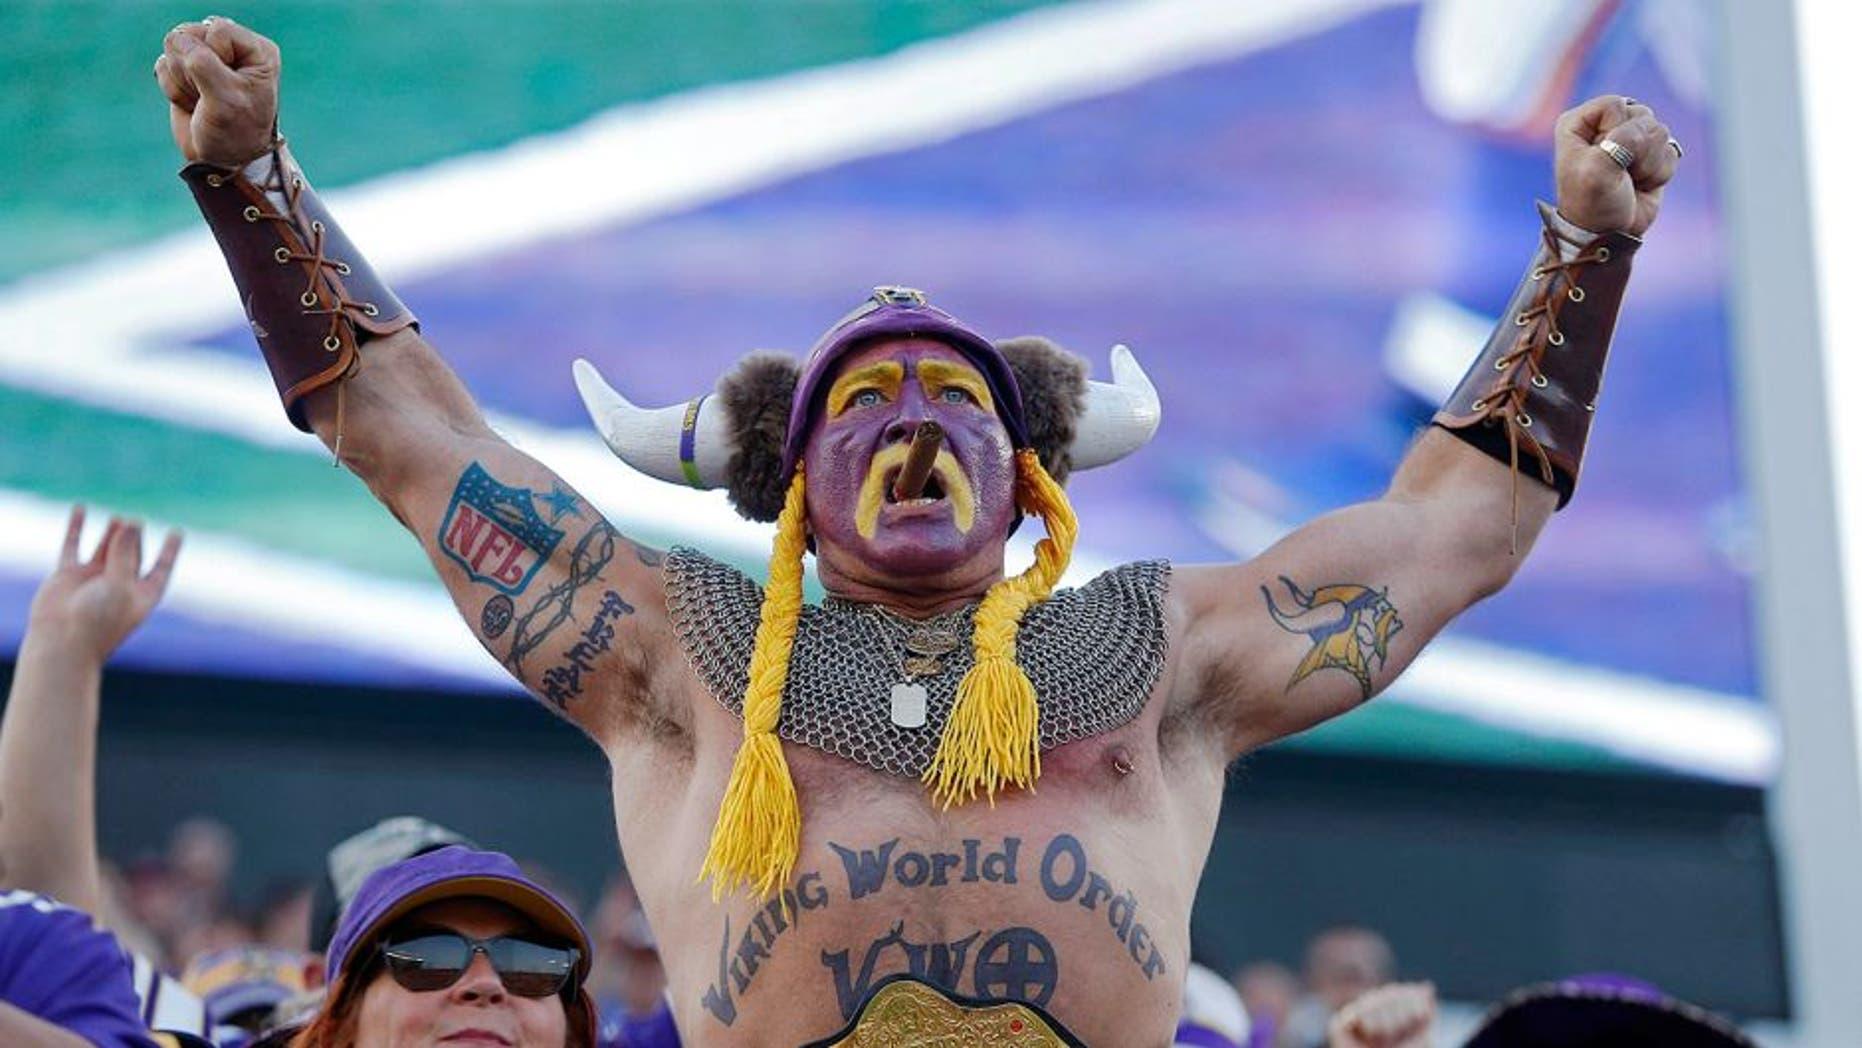 Sep 28, 2014; Minneapolis, MN, USA; Minnesota Vikings fan Syd Davy cheers for his team as they play the Atlanta Falcons at TCF Bank Stadium. The Vikings win 41-28. Mandatory Credit: Bruce Kluckhohn-USA TODAY Sports